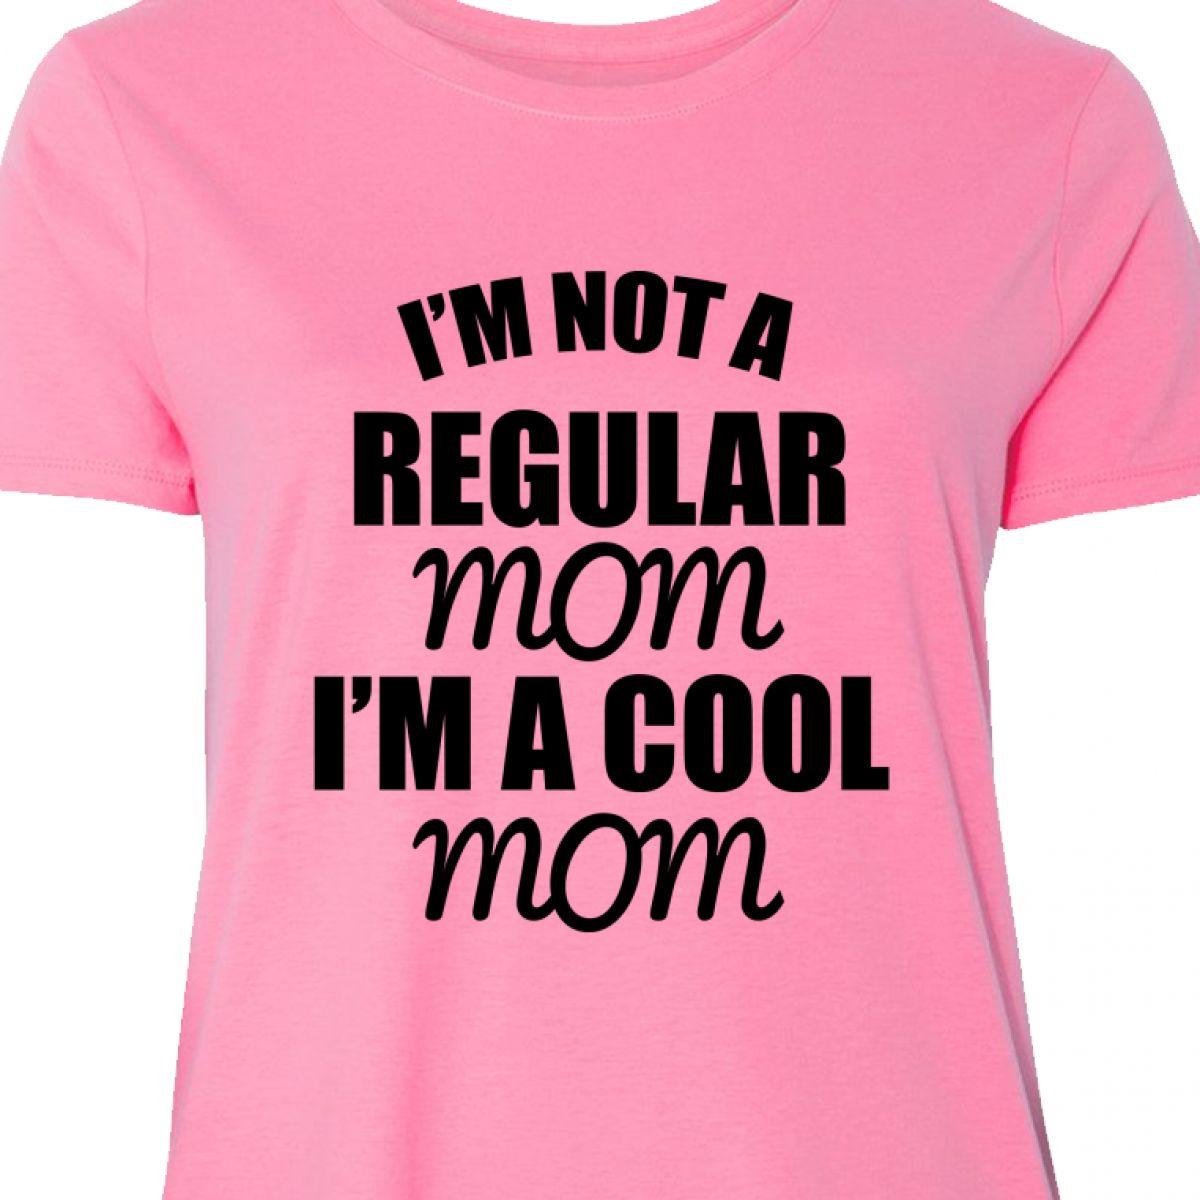 7b5ae54b5d577 Inktastic I m Not A Regular Mom I m A Cool Mom Women s Plus Size T ...